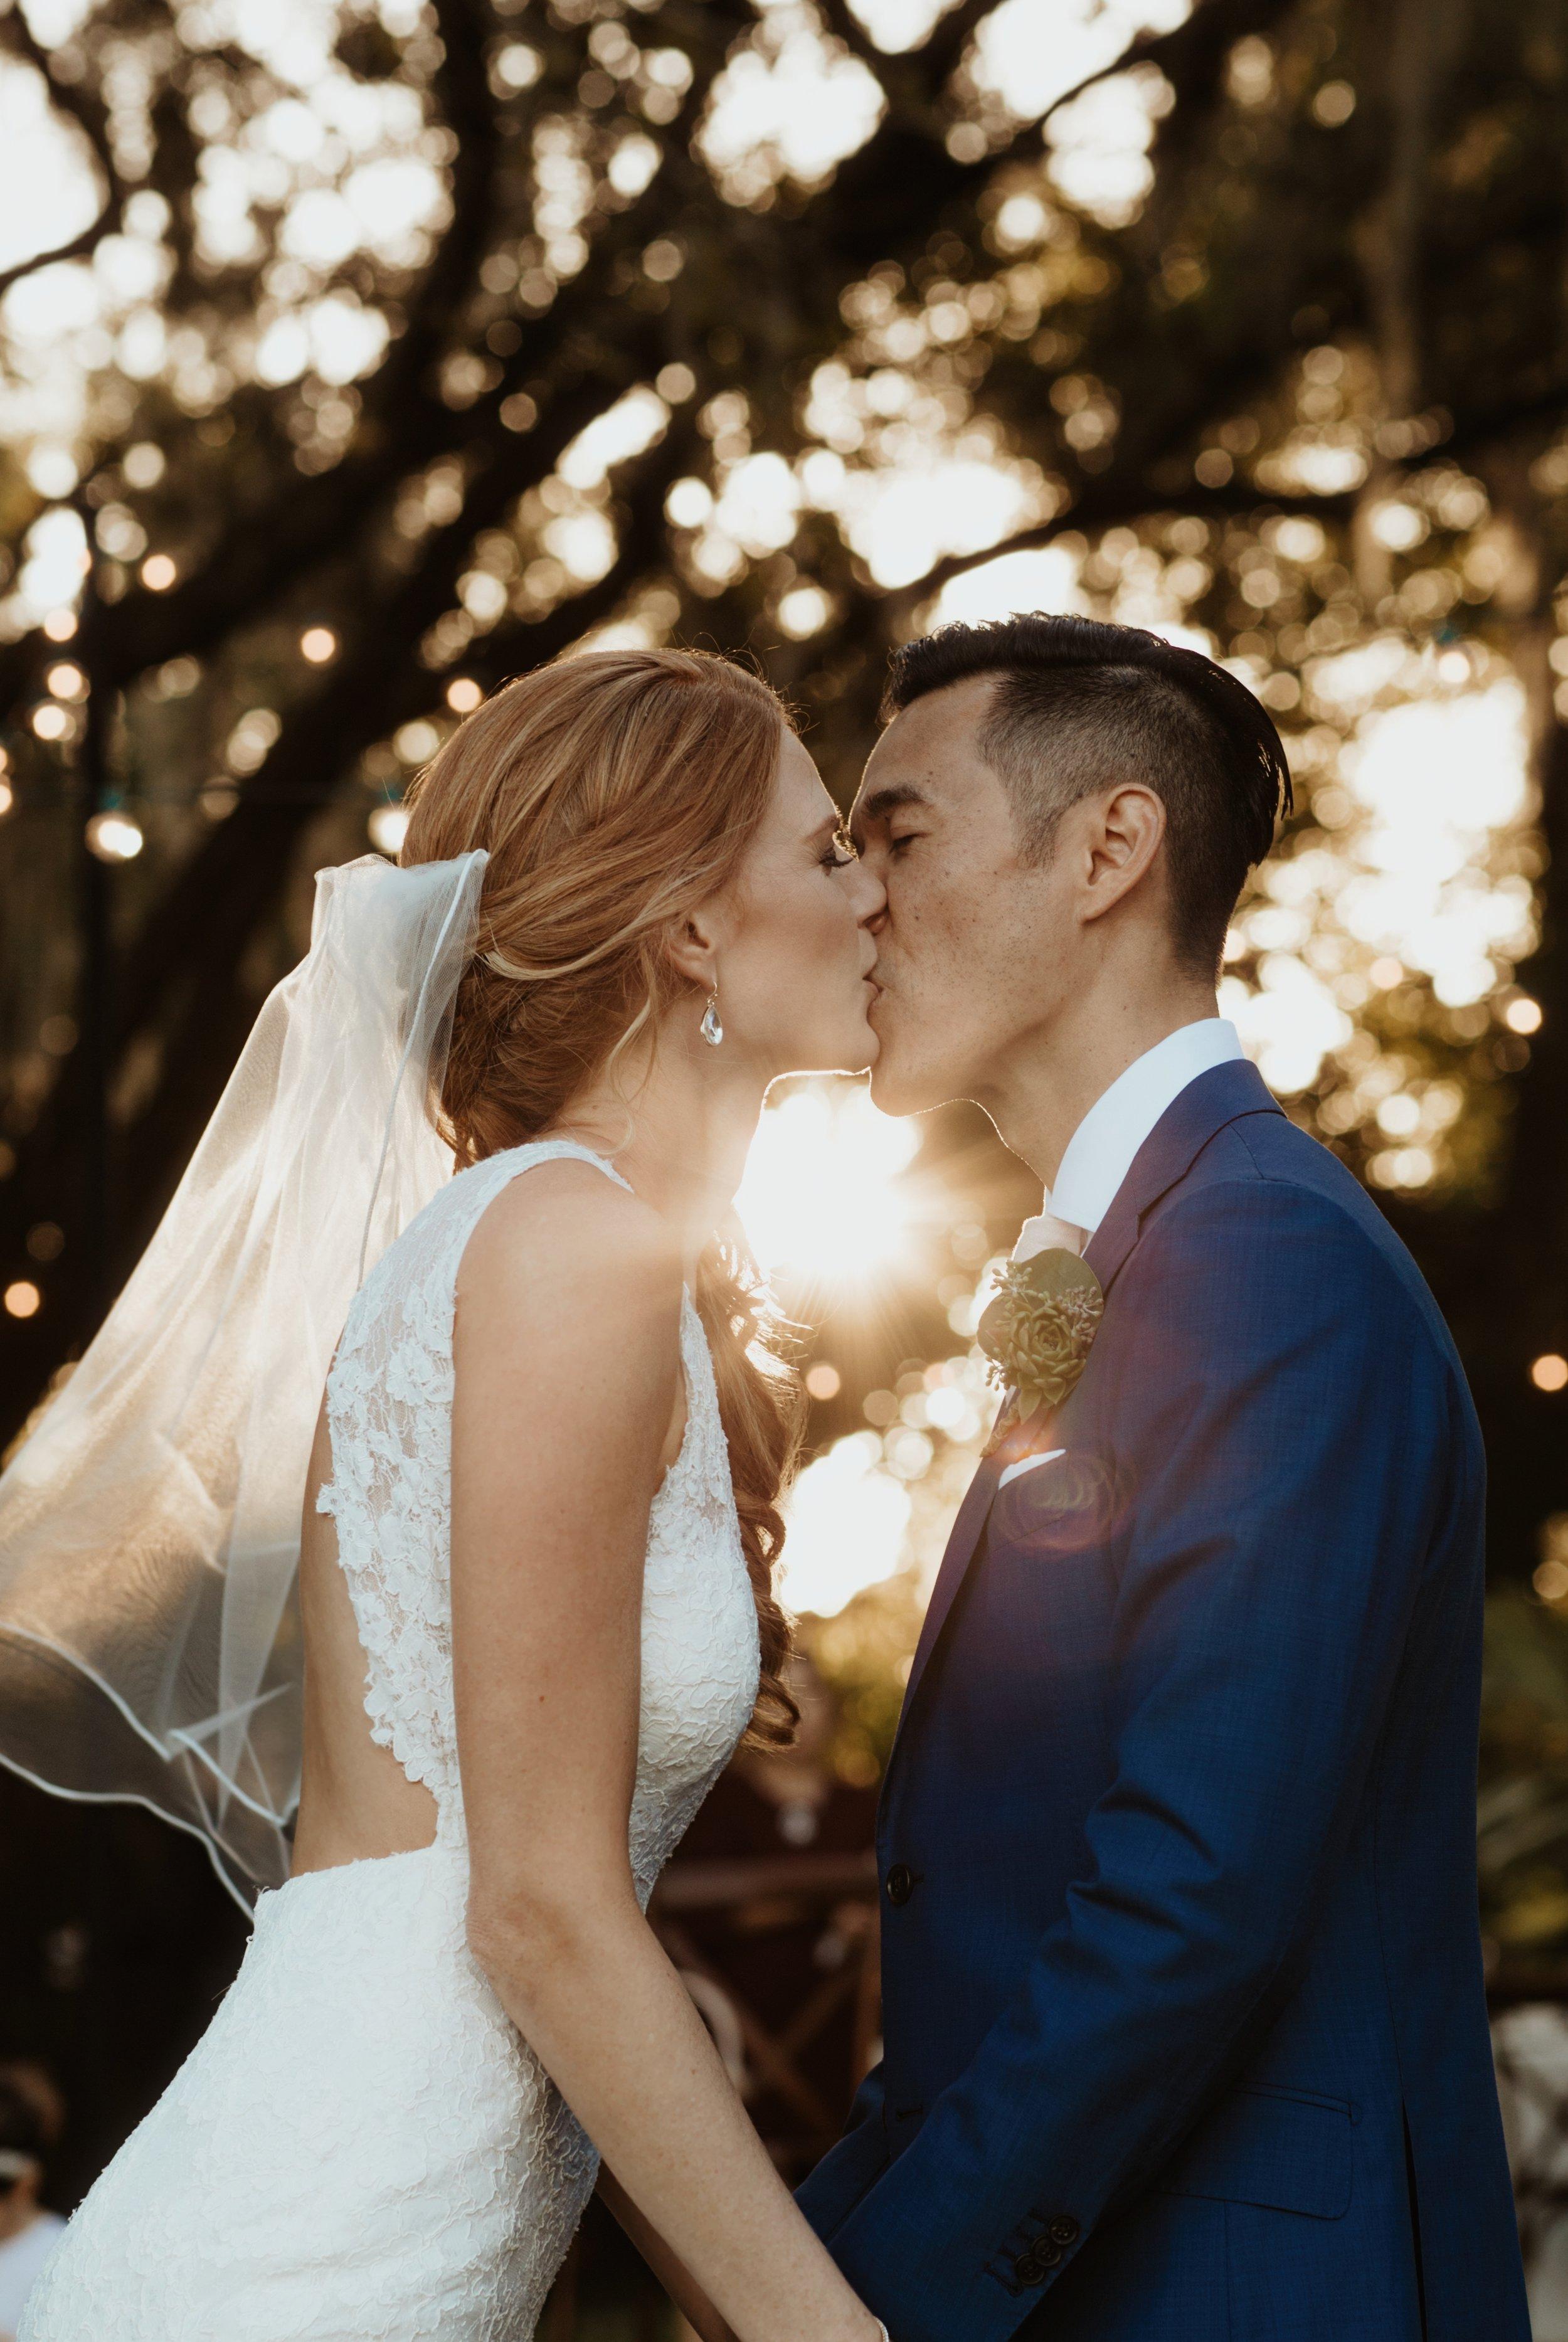 Wedding Day | Vanessa Boy | vanessaboy.com-866.com .jpg